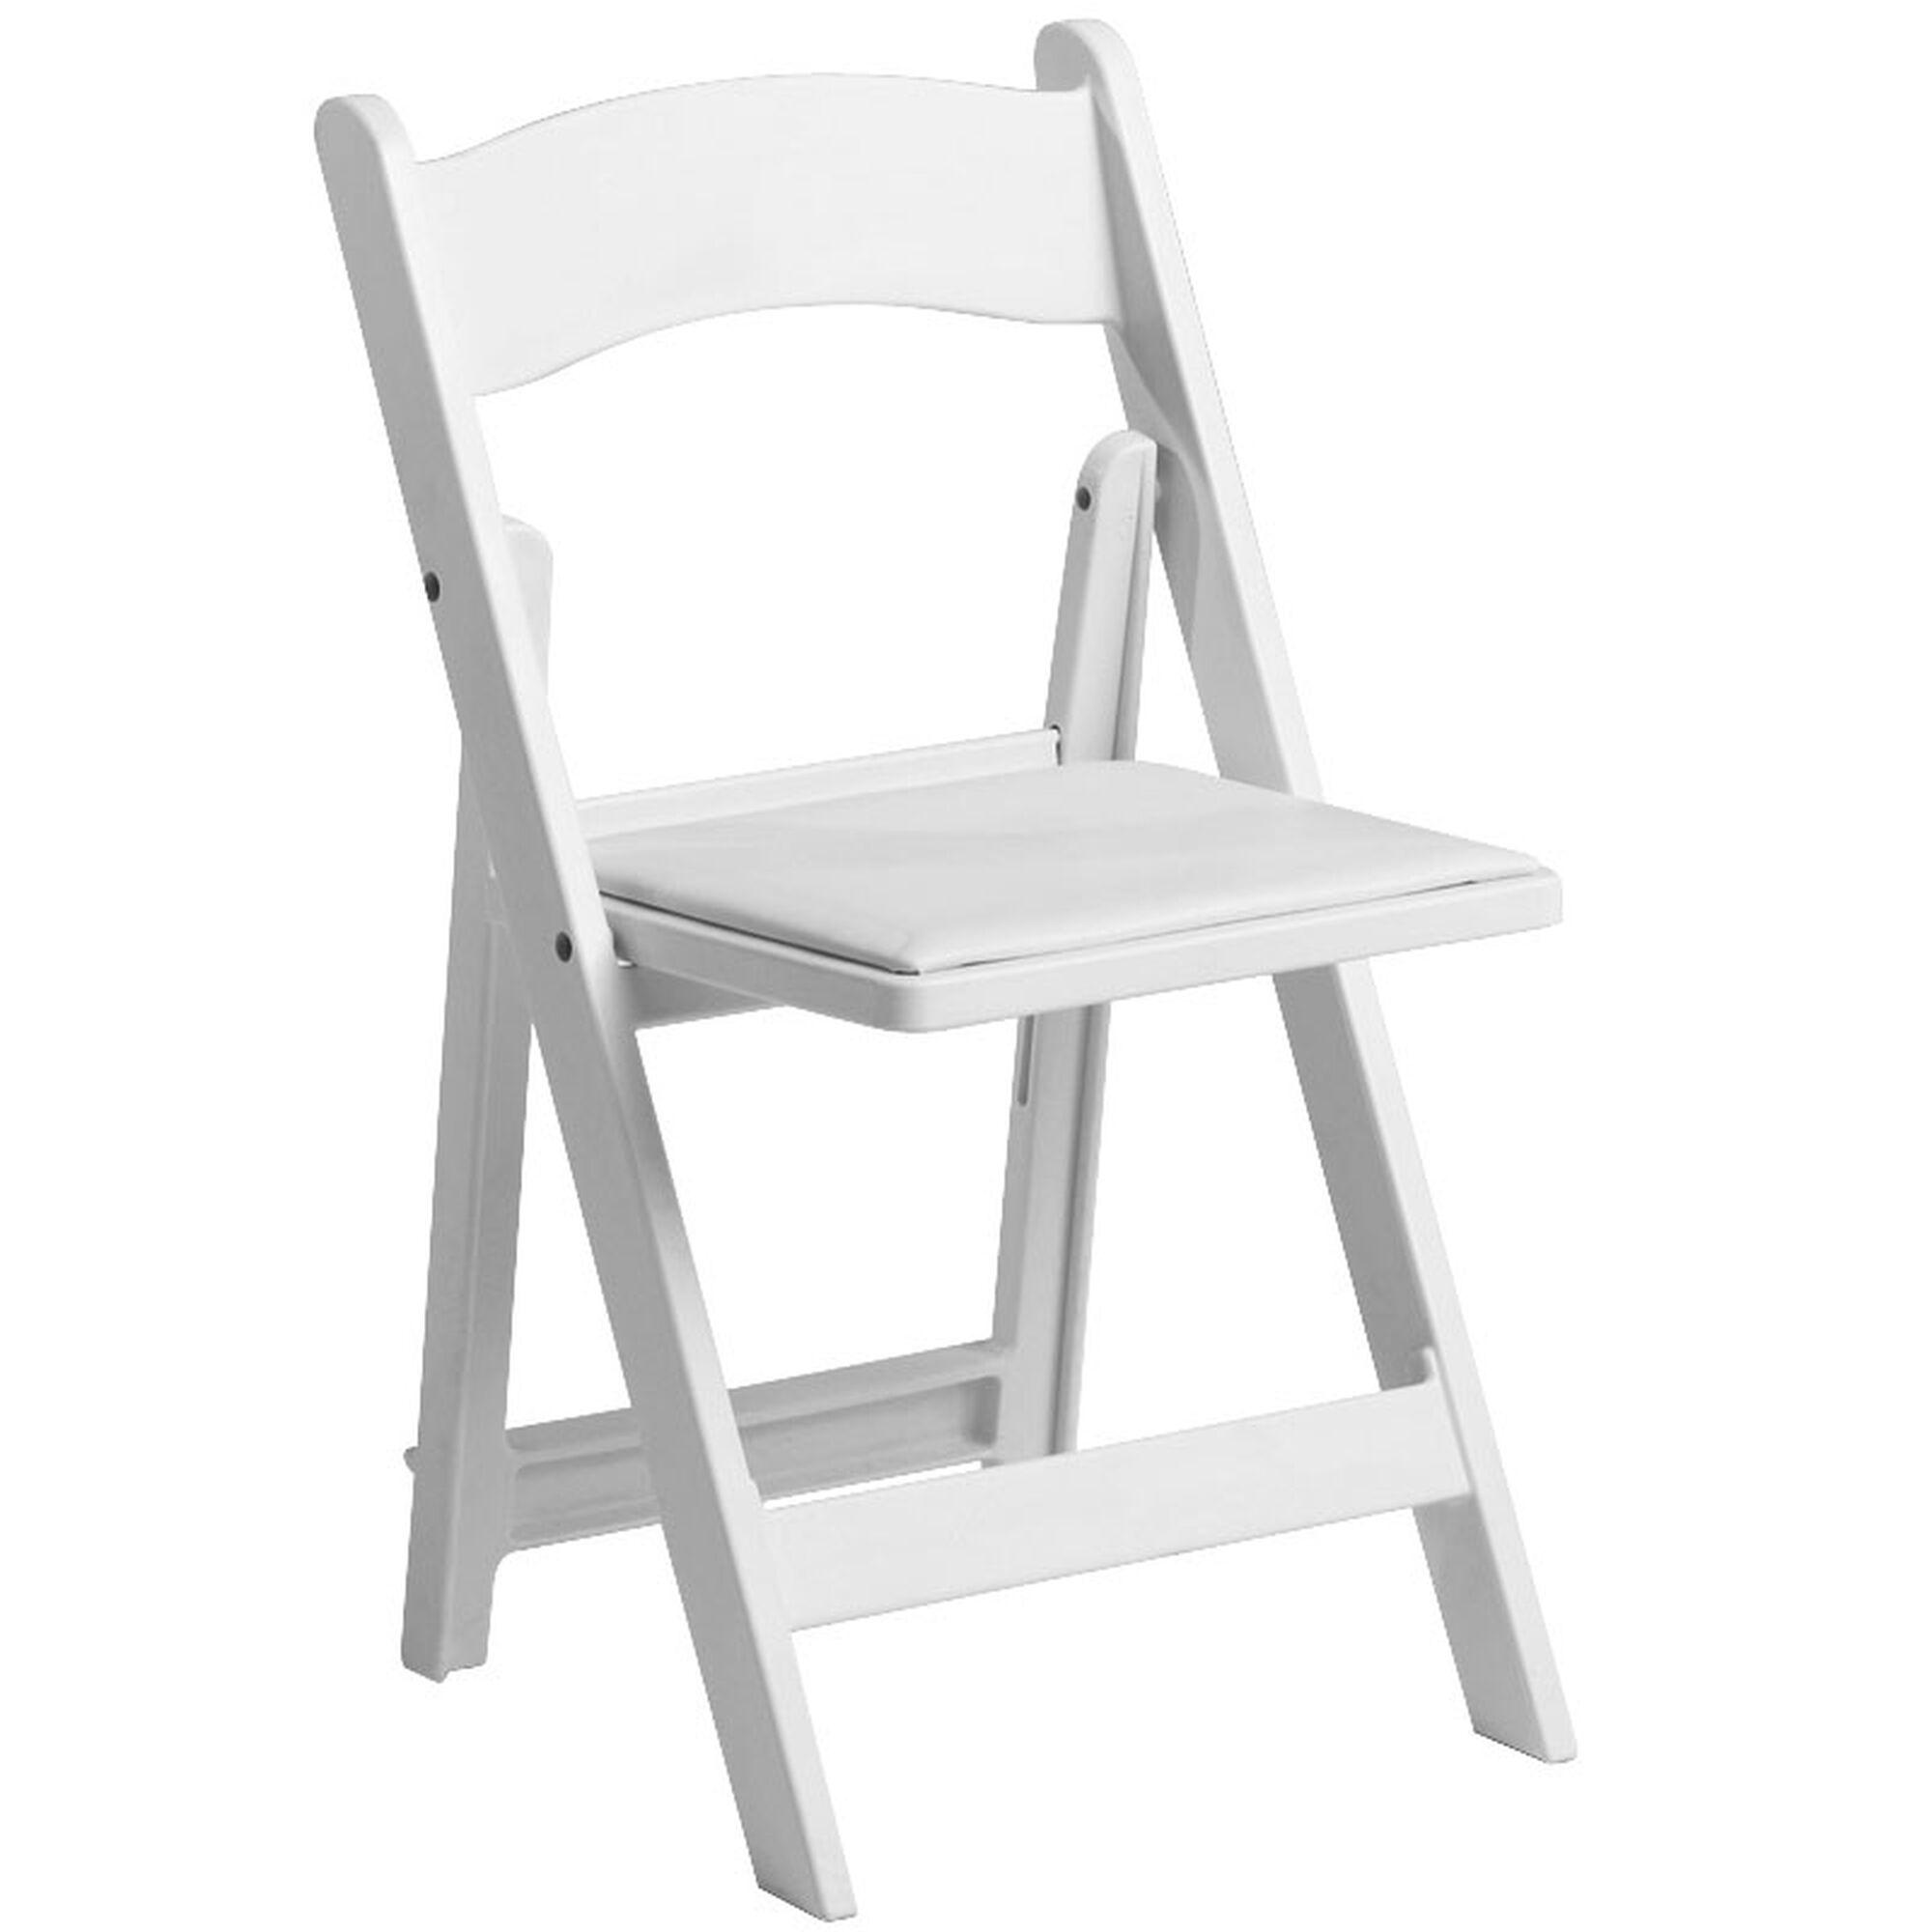 White Resin Folding Chair R 101 Wh Web1 Foldingchairs4less Com